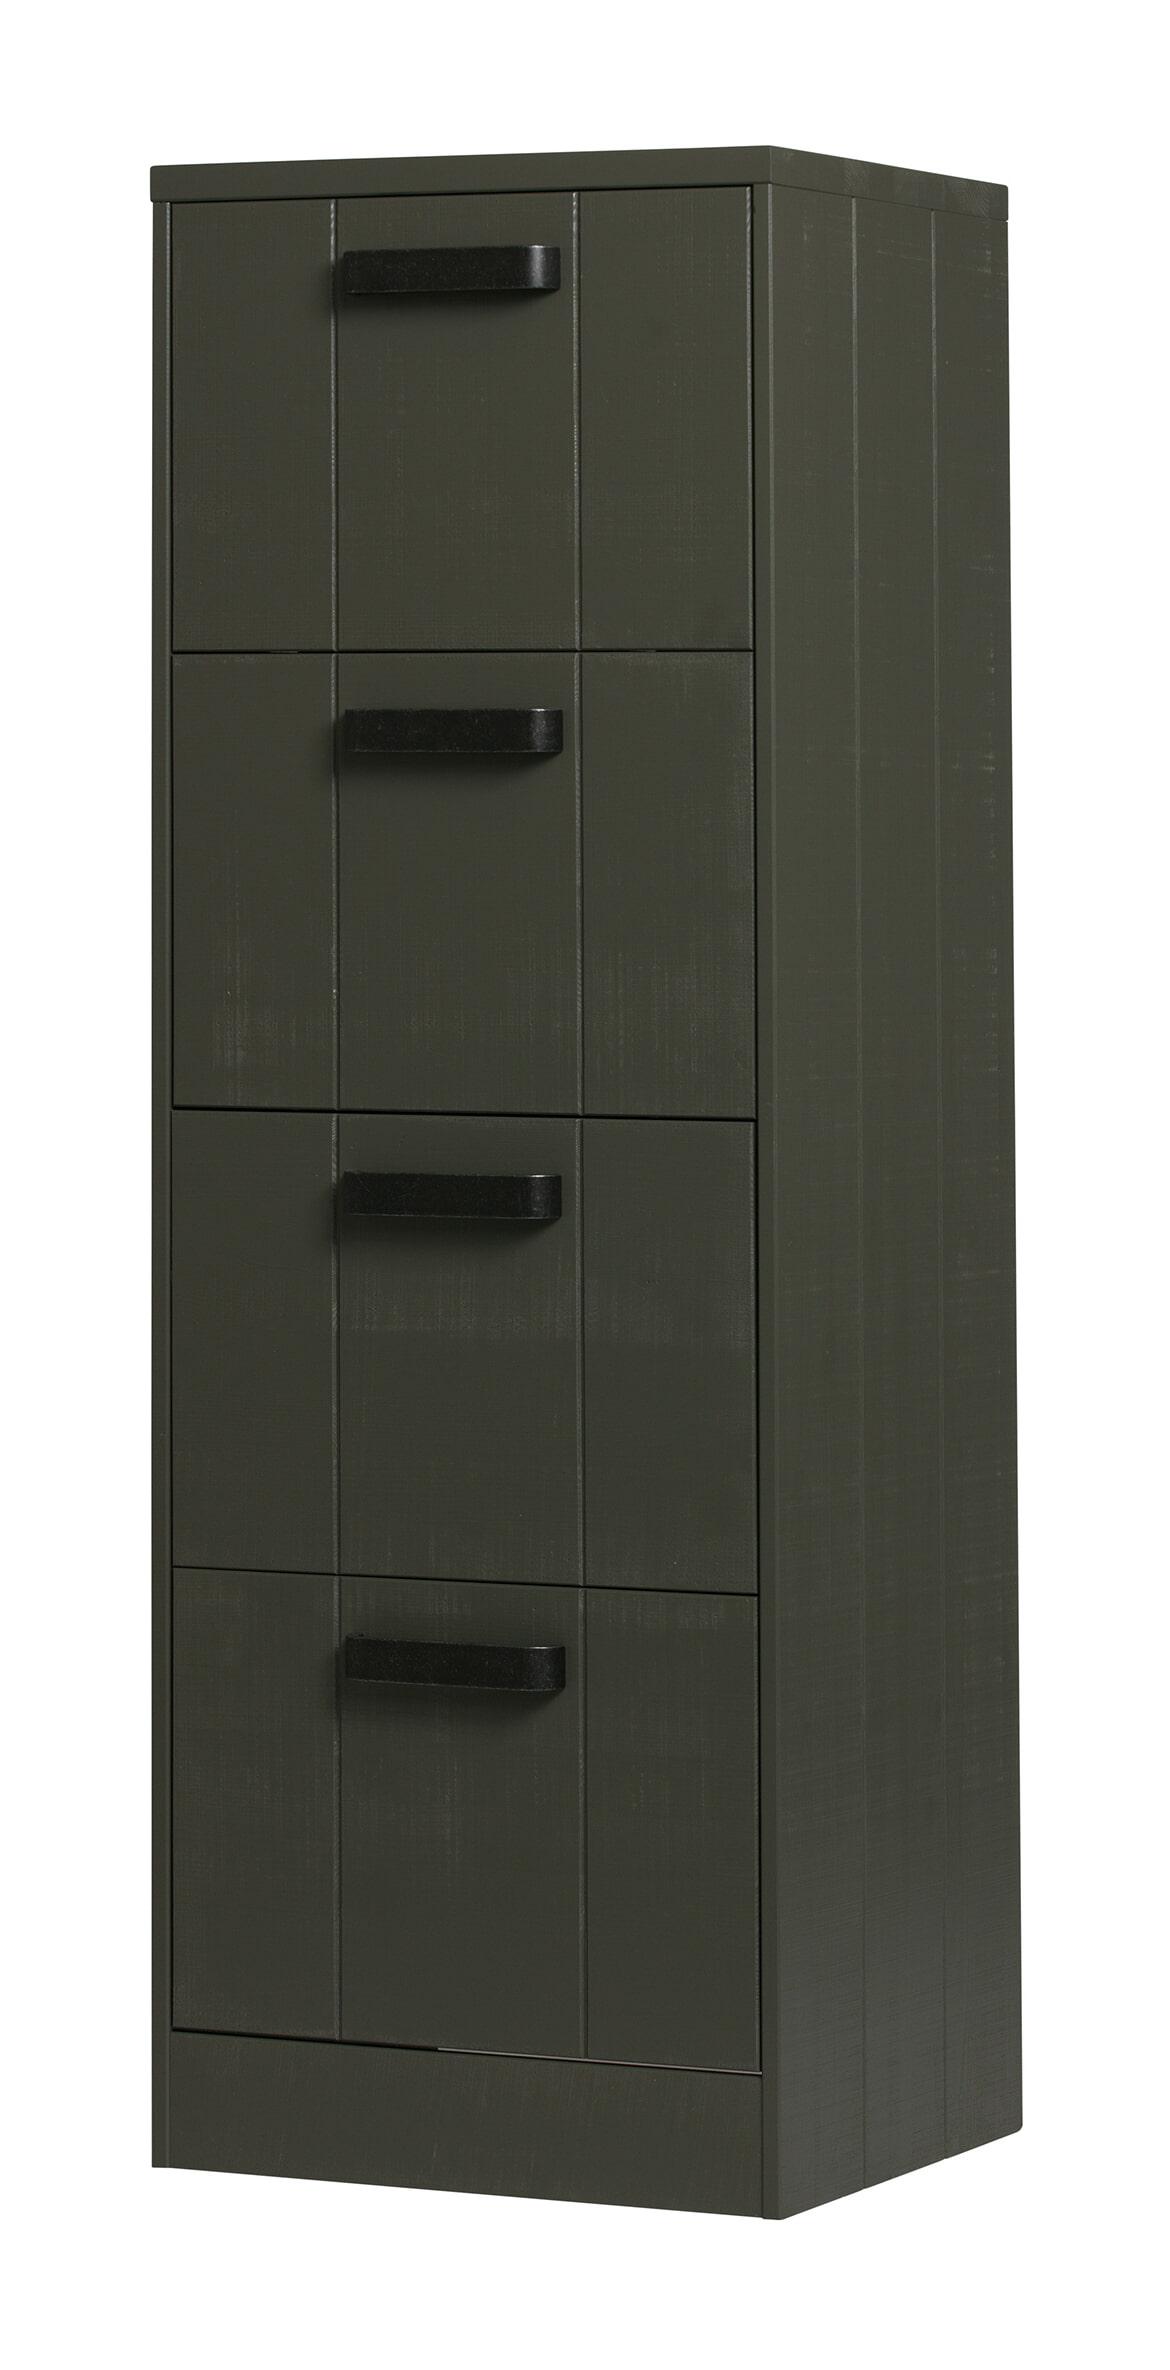 BePureHome Ladenkast 'File', kleur Forest Green Grofgezaagd grenenhout aanschaffen? Kijk hier!